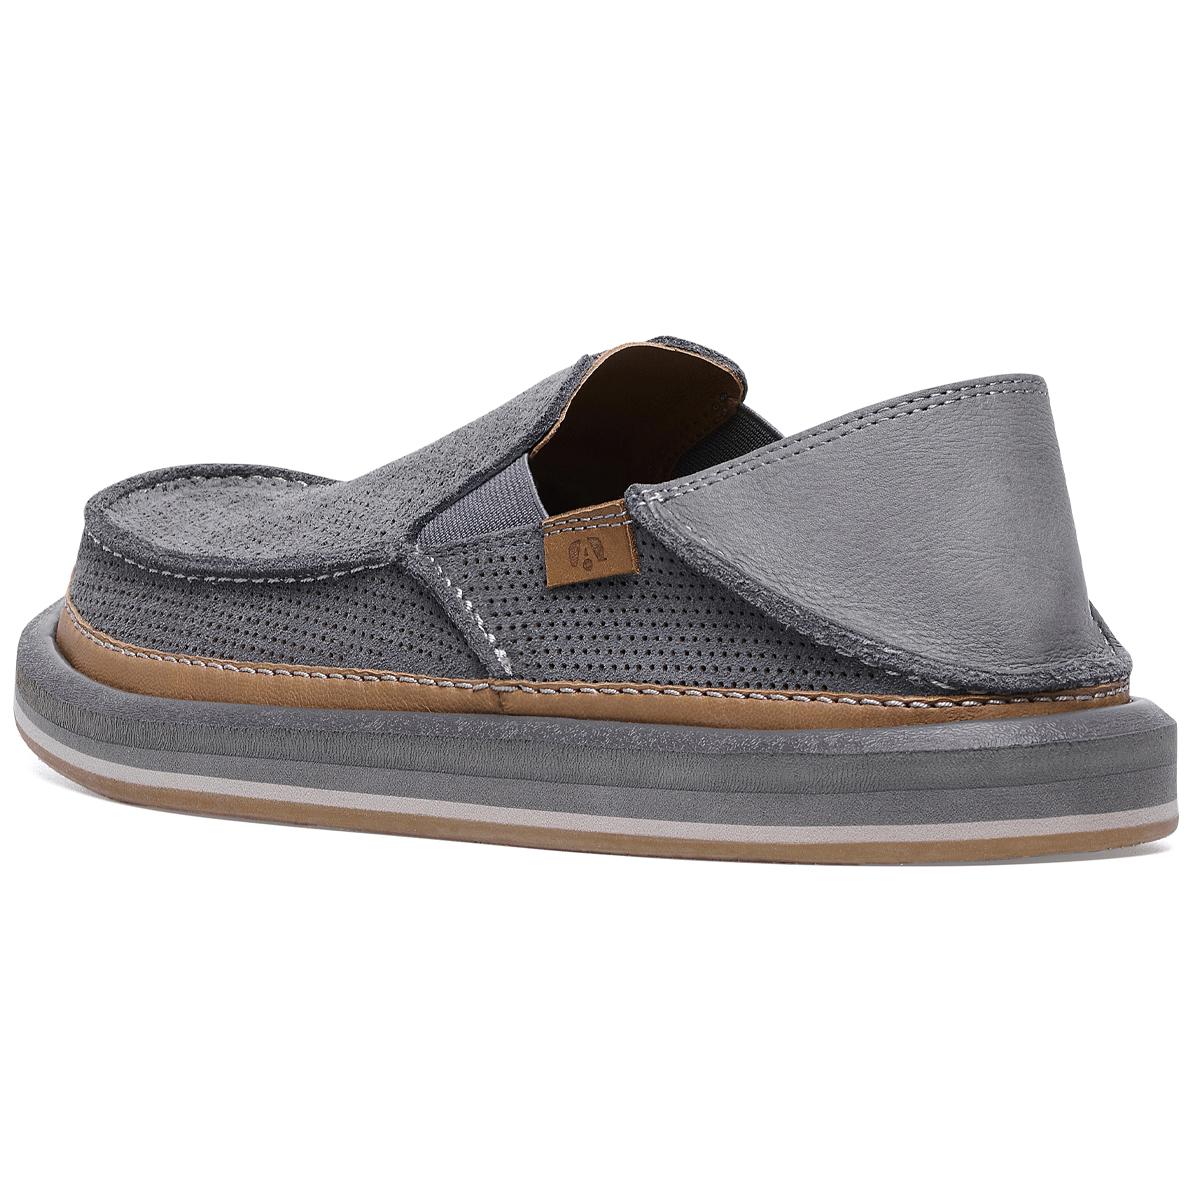 Sanuk-Shoe-Vagabond-St-X-Airstream-Leather-Grey-3